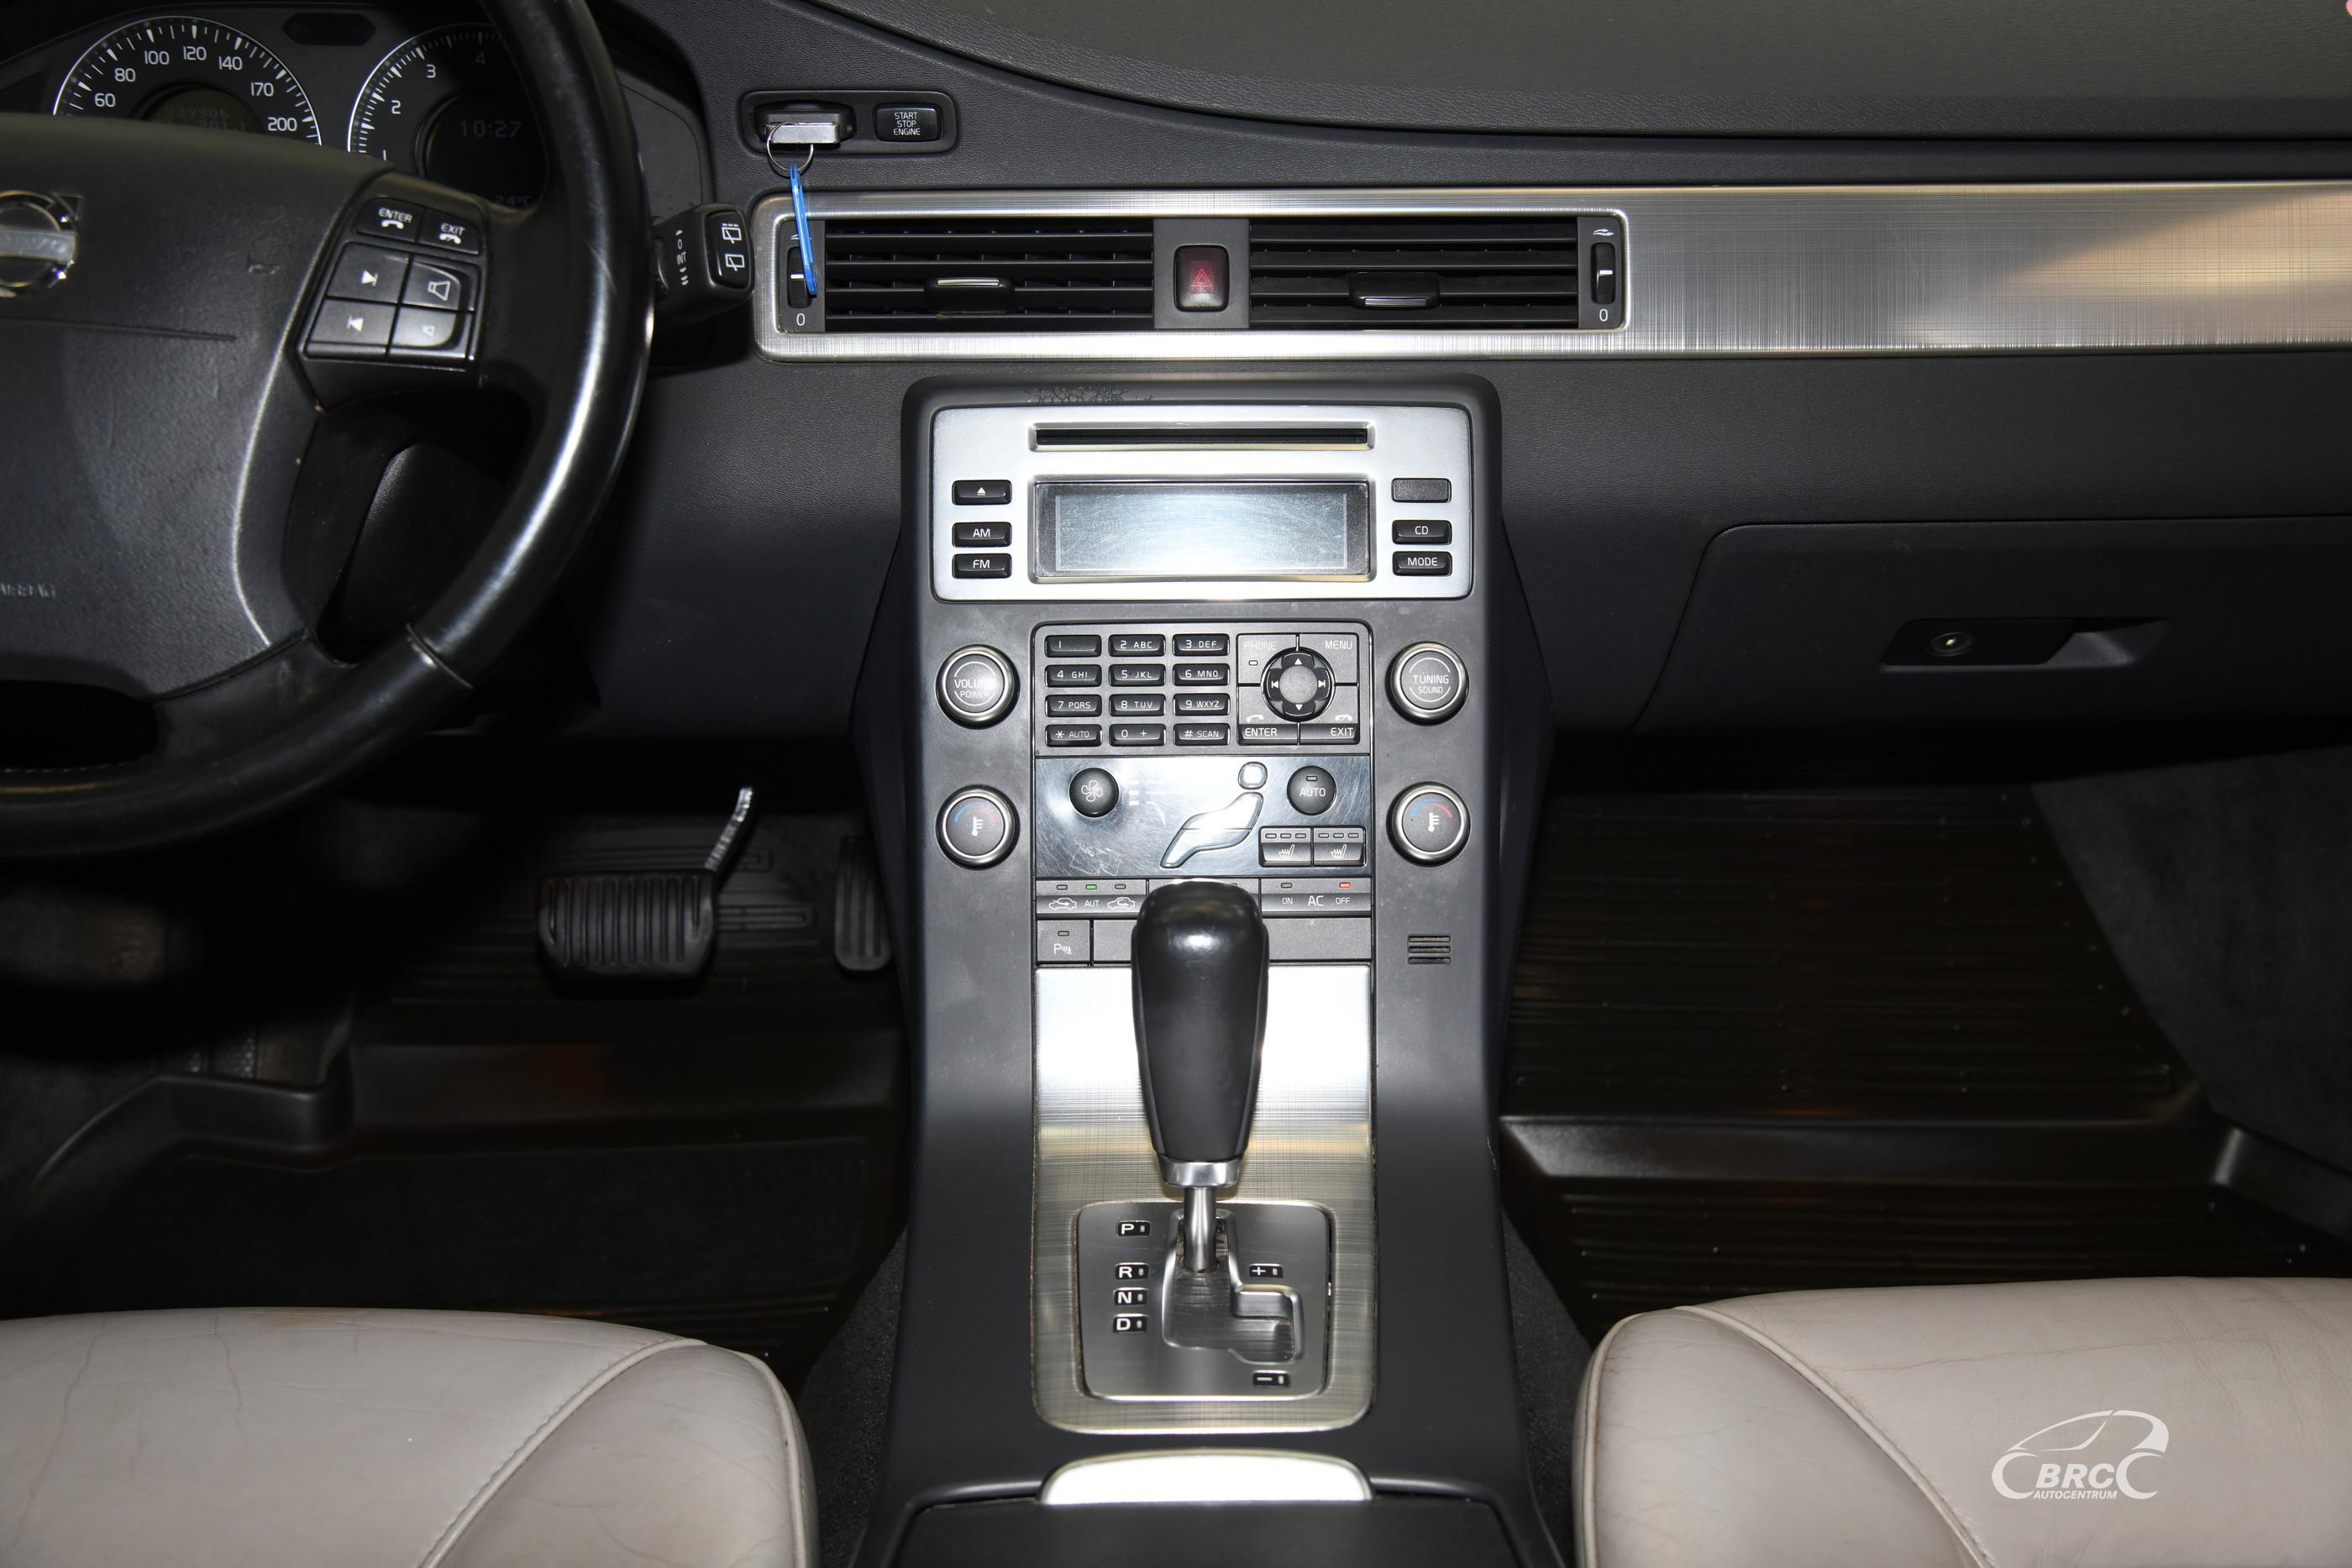 Volvo V70 3.2 DUJOS